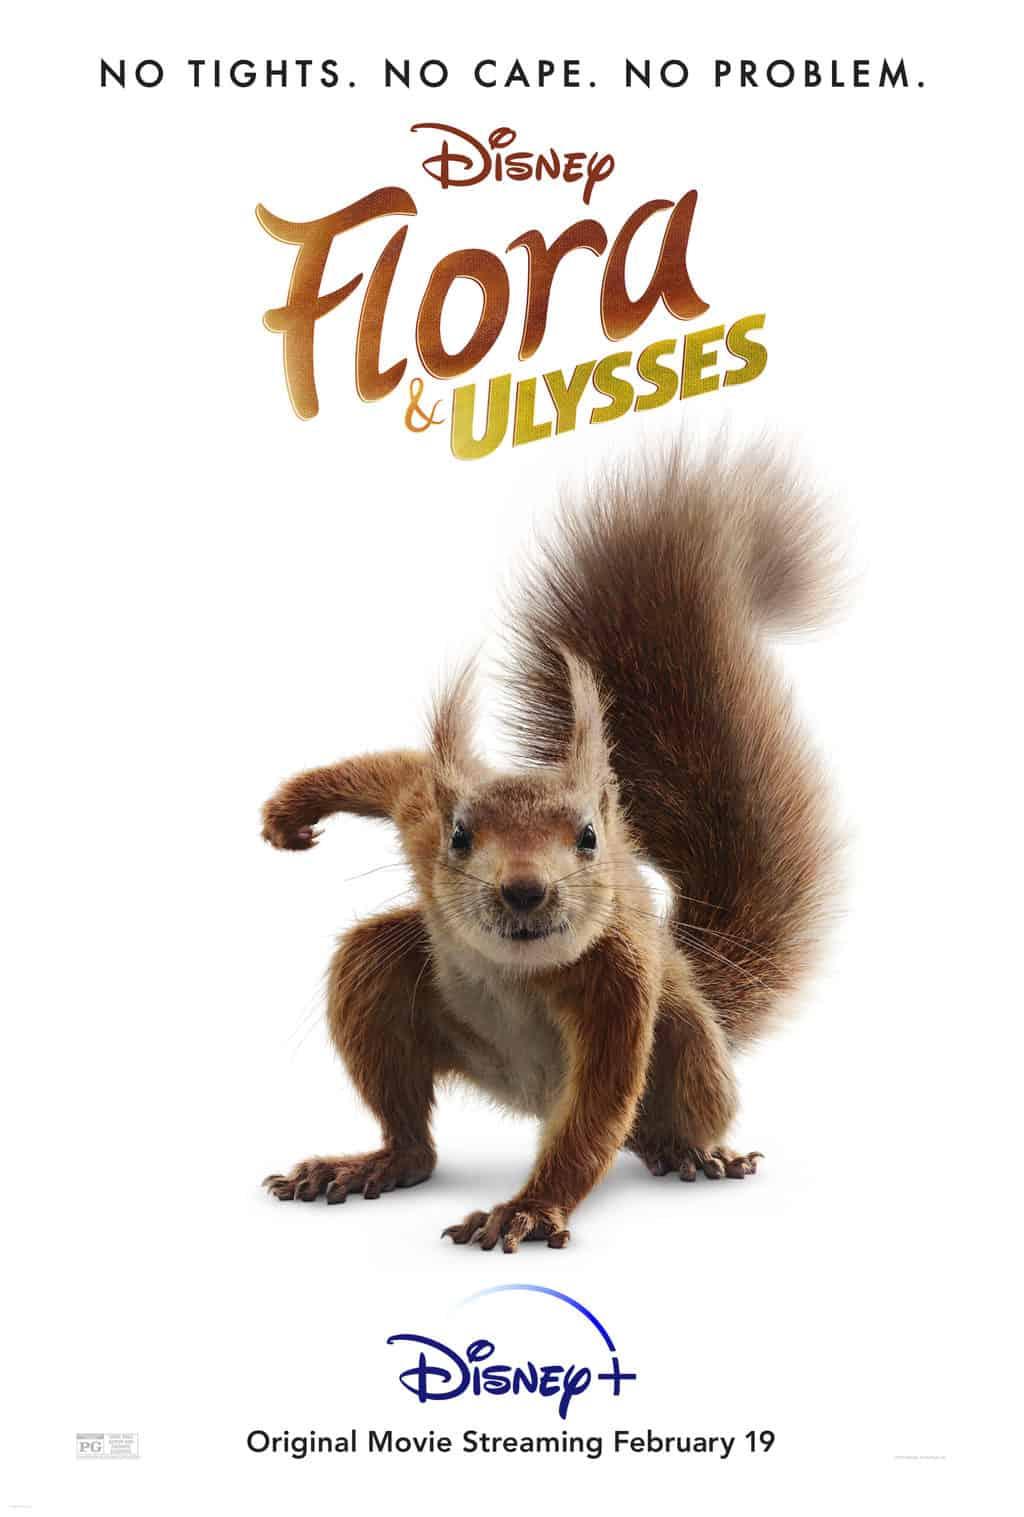 is flora and ulysses safe for kids movie poster